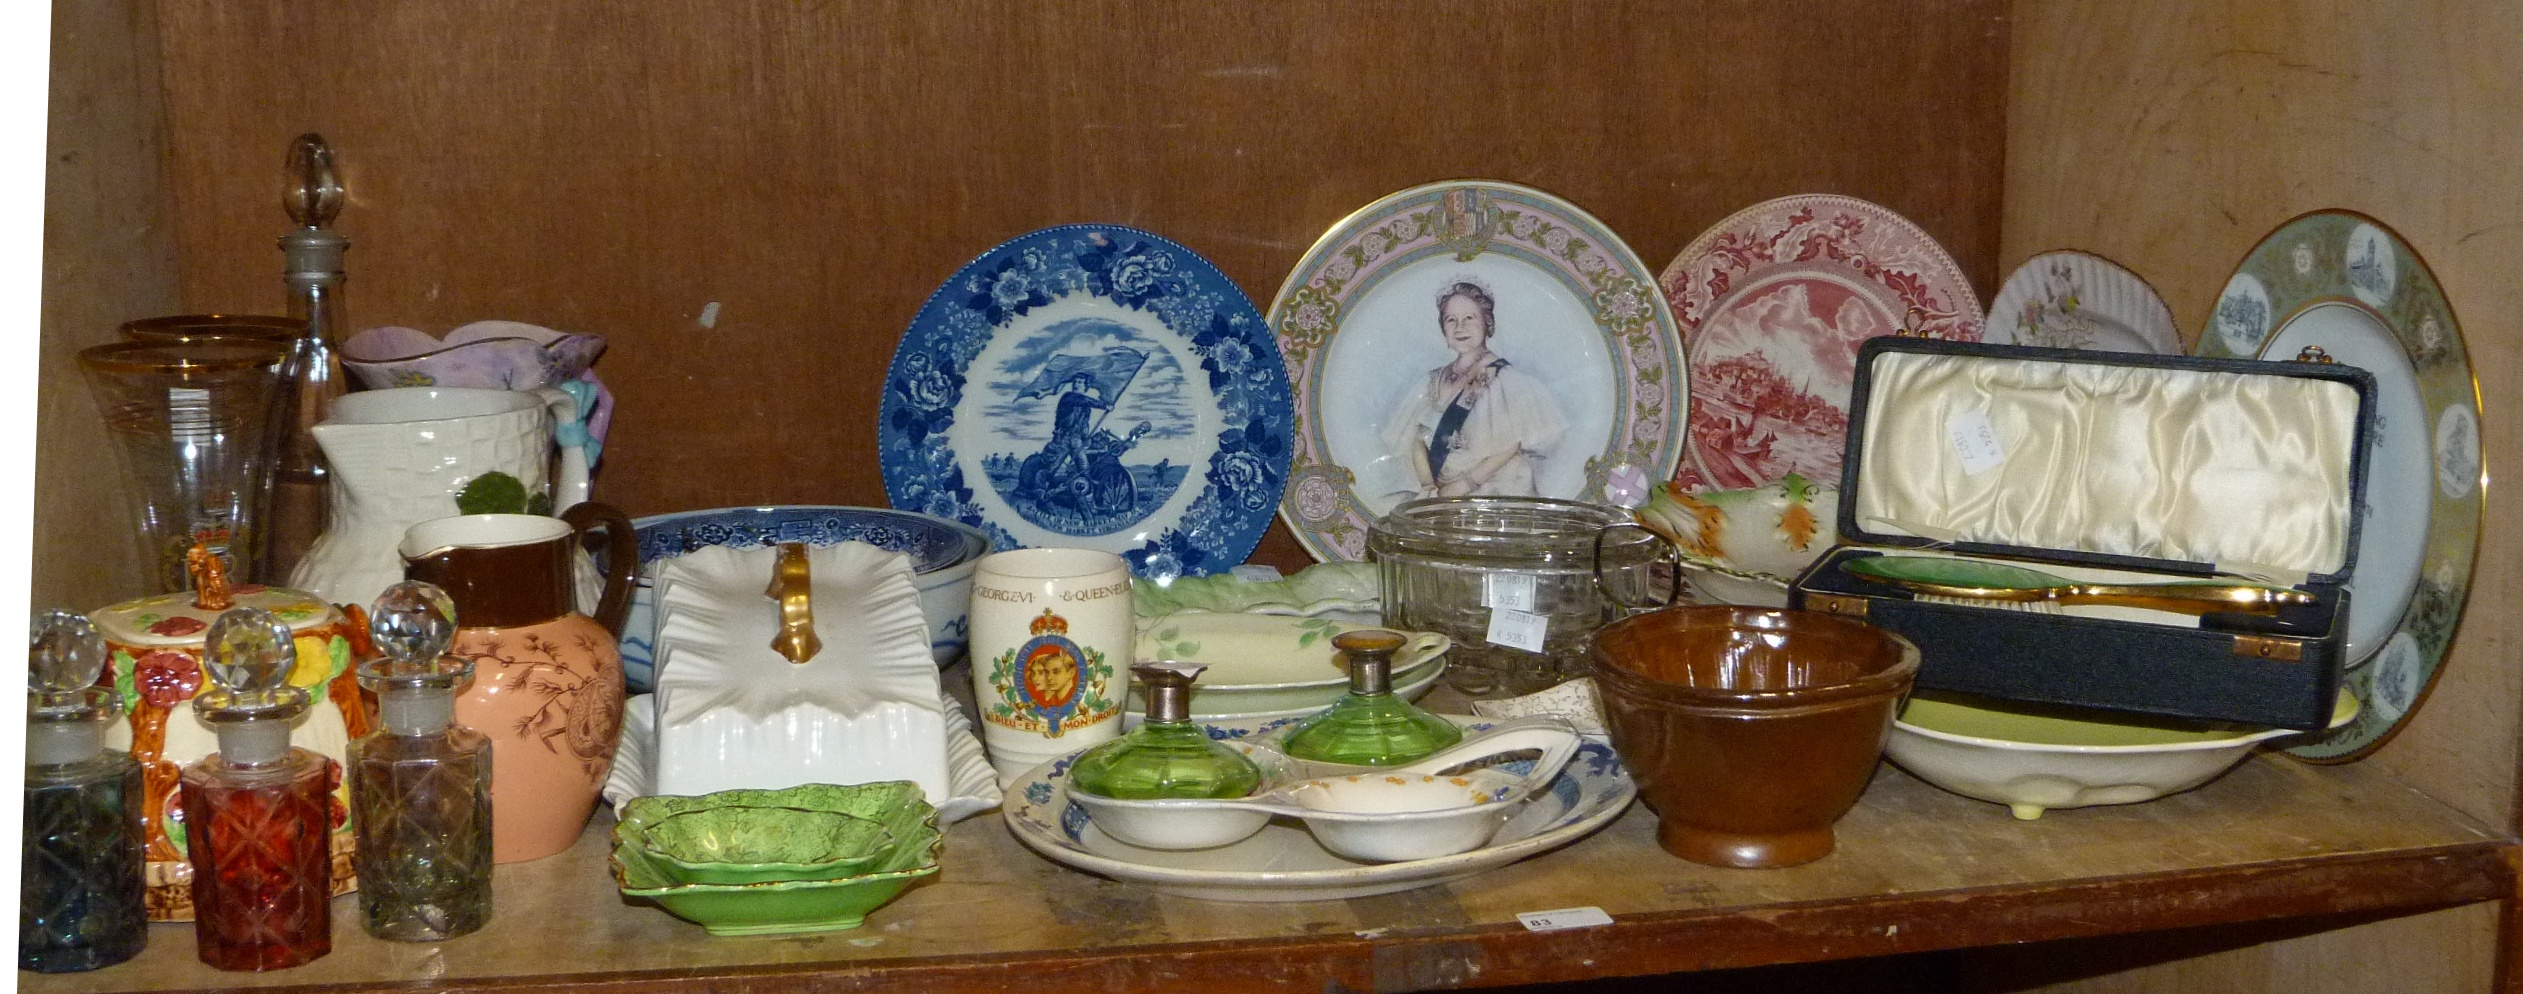 Lot 83 - A Victorian saltglazed jelly mould, two pressed glass jelly mould, decorative ceramics, jugs,